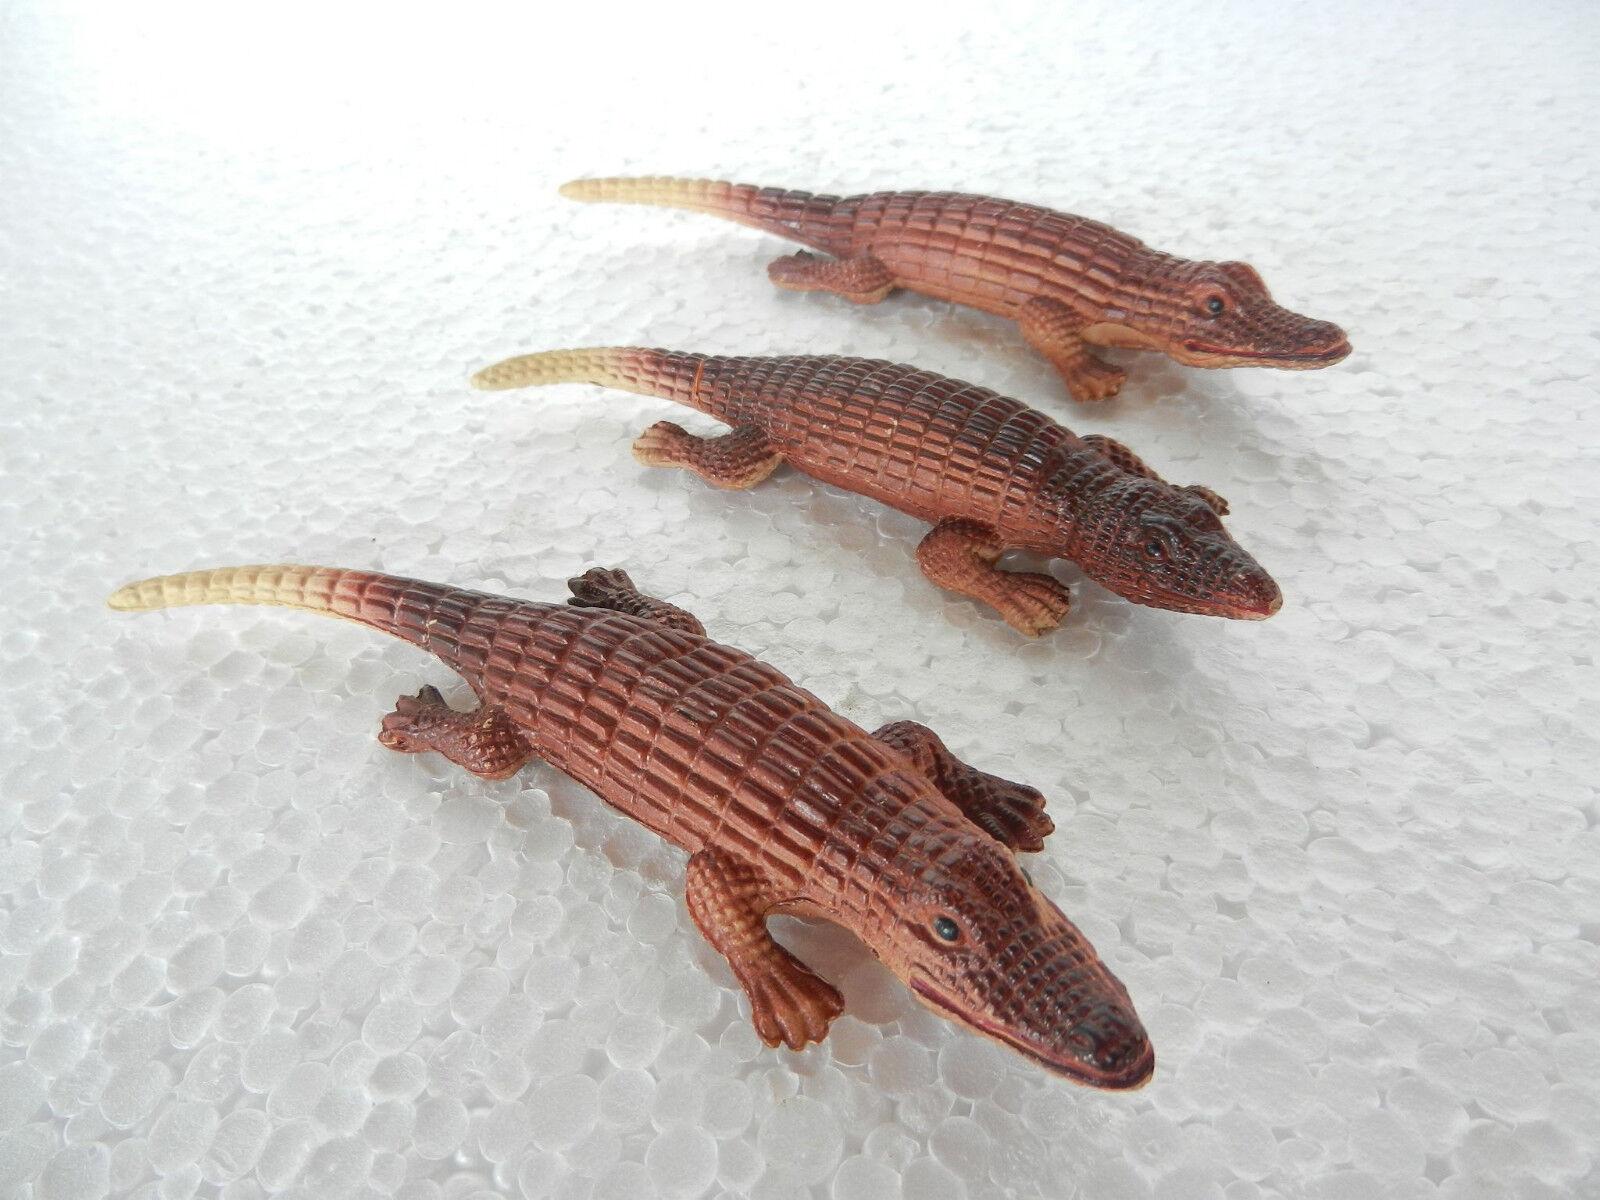 Vintage - menge 3 zelluloid krokodil   alligator spielzeug abbildung, japan